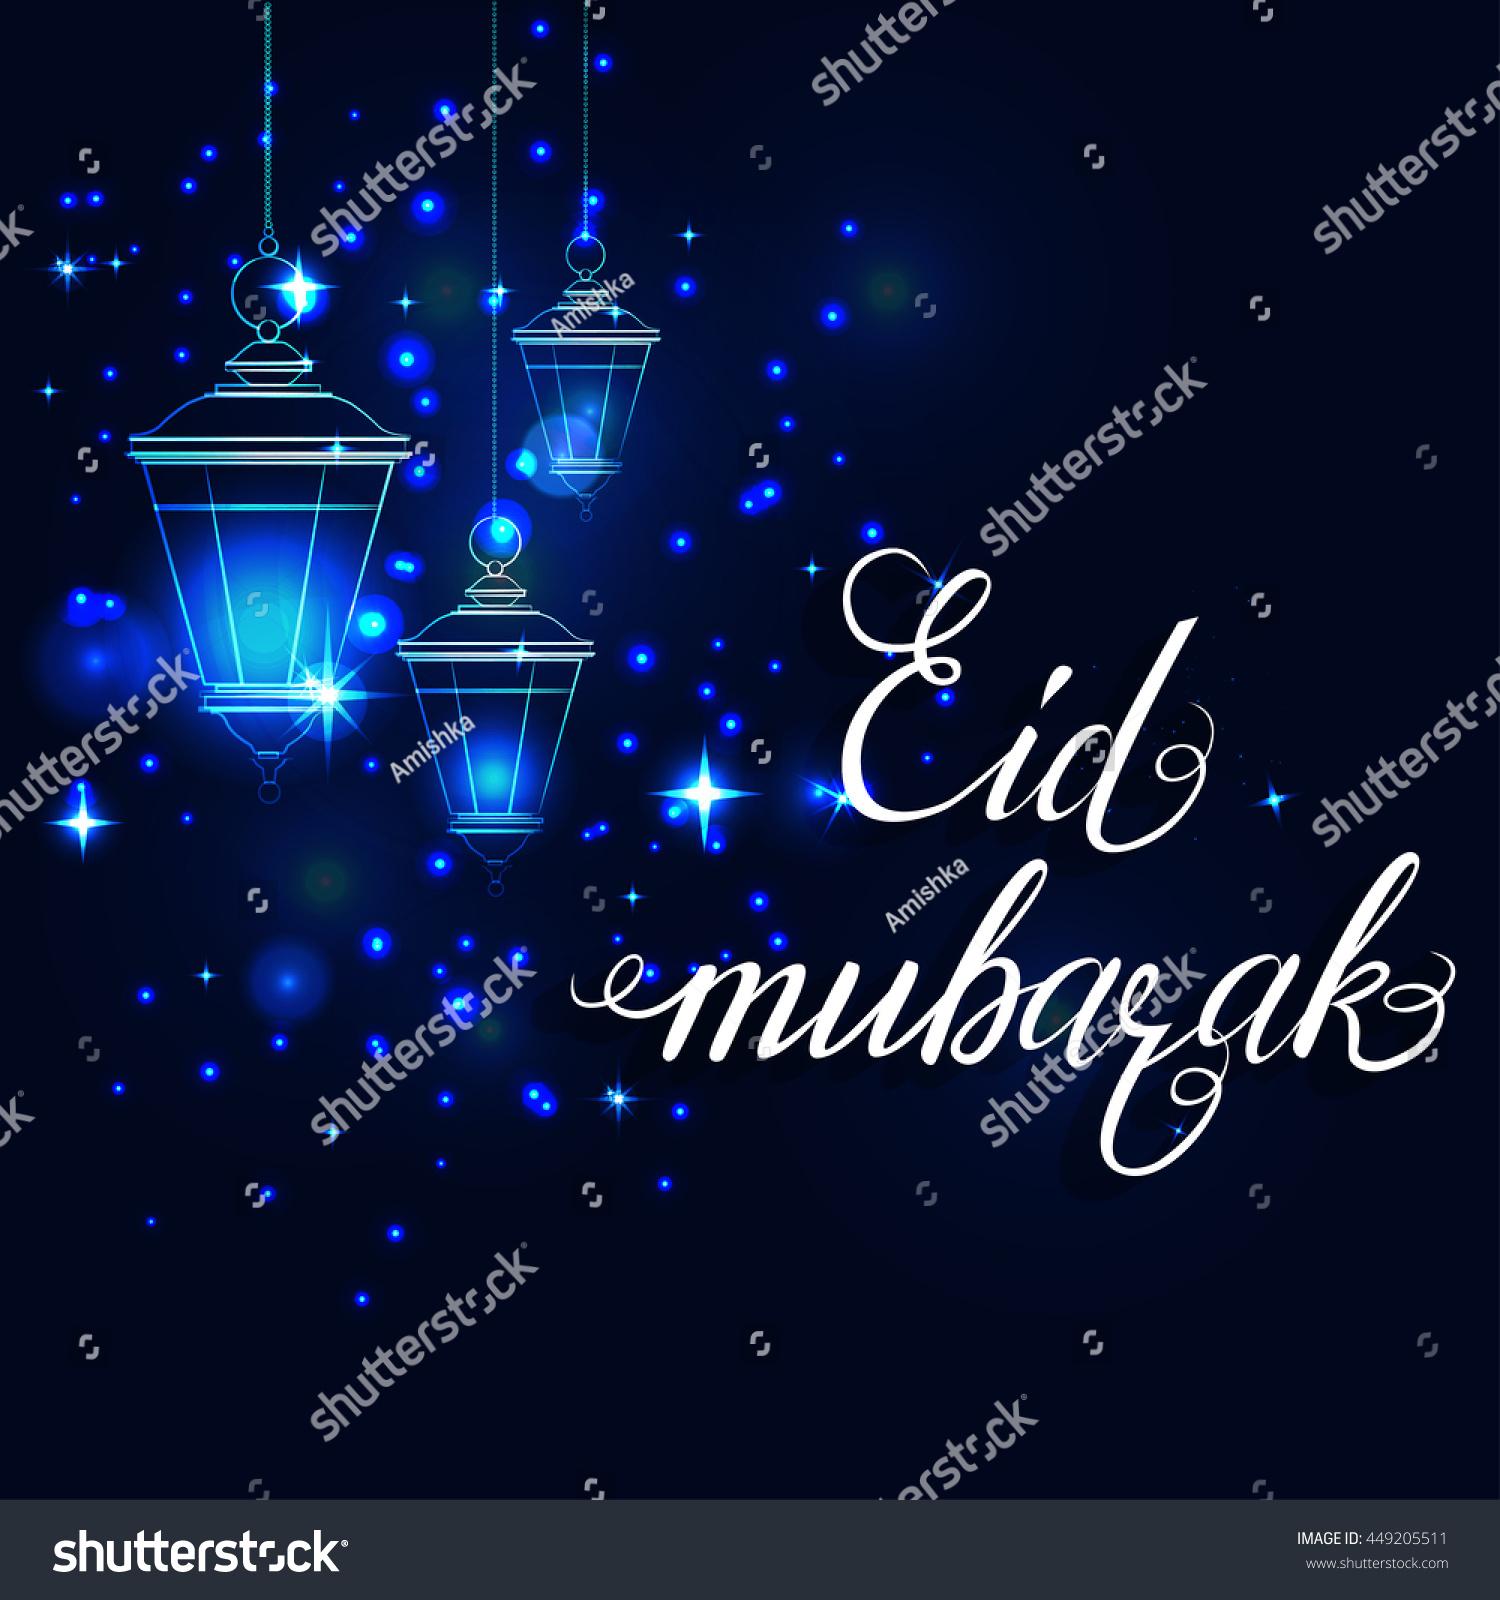 Illustration Eid Mubarak Holiday After Ramadan Stock Illustration